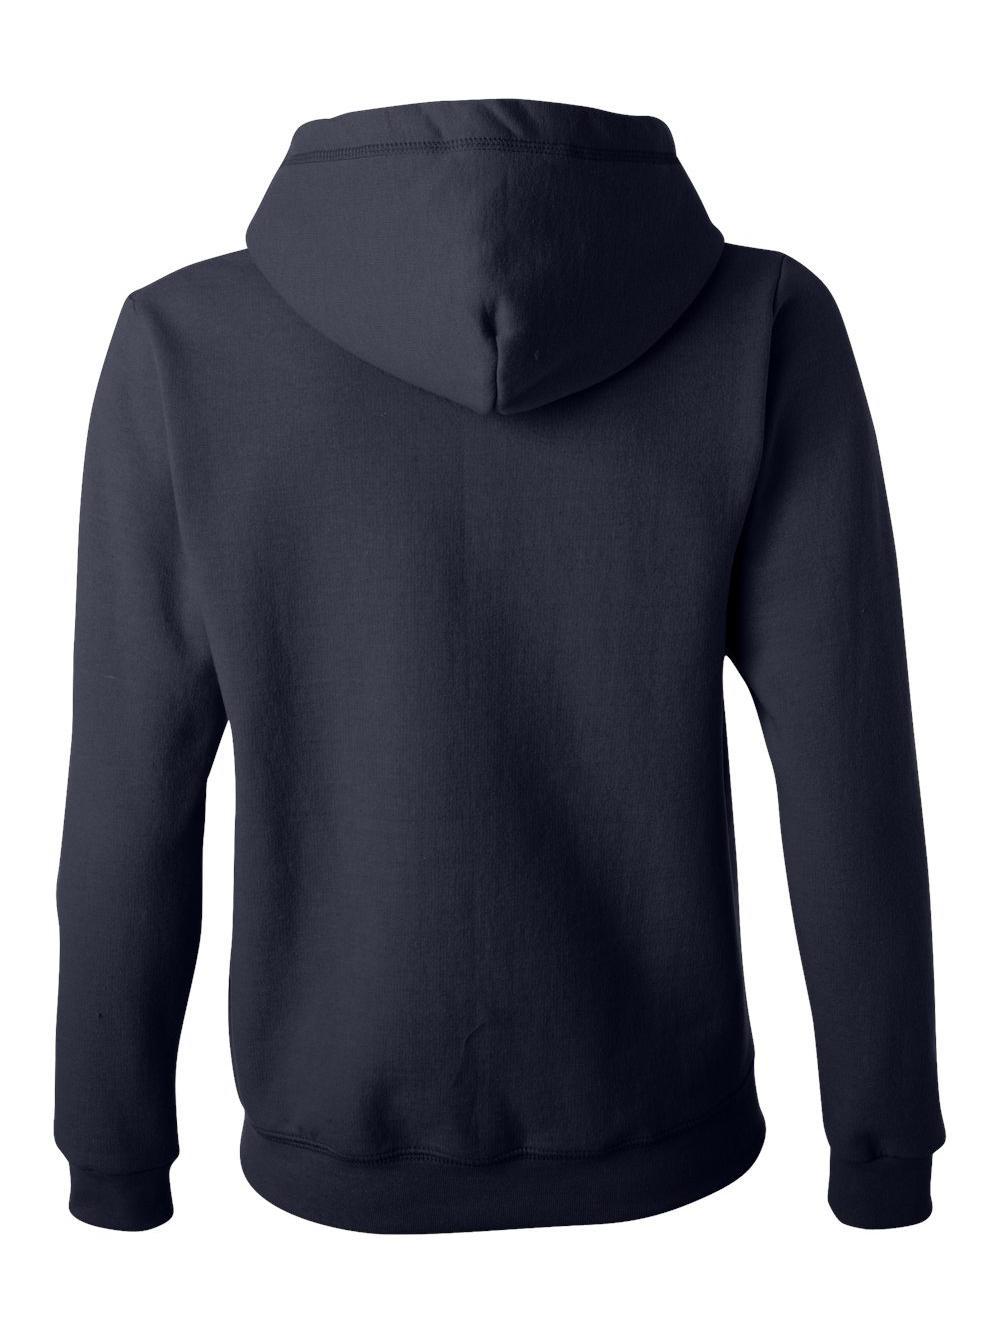 Gildan-Heavy-Blend-Women-039-s-Full-Zip-Hooded-Sweatshirt-18600FL thumbnail 10